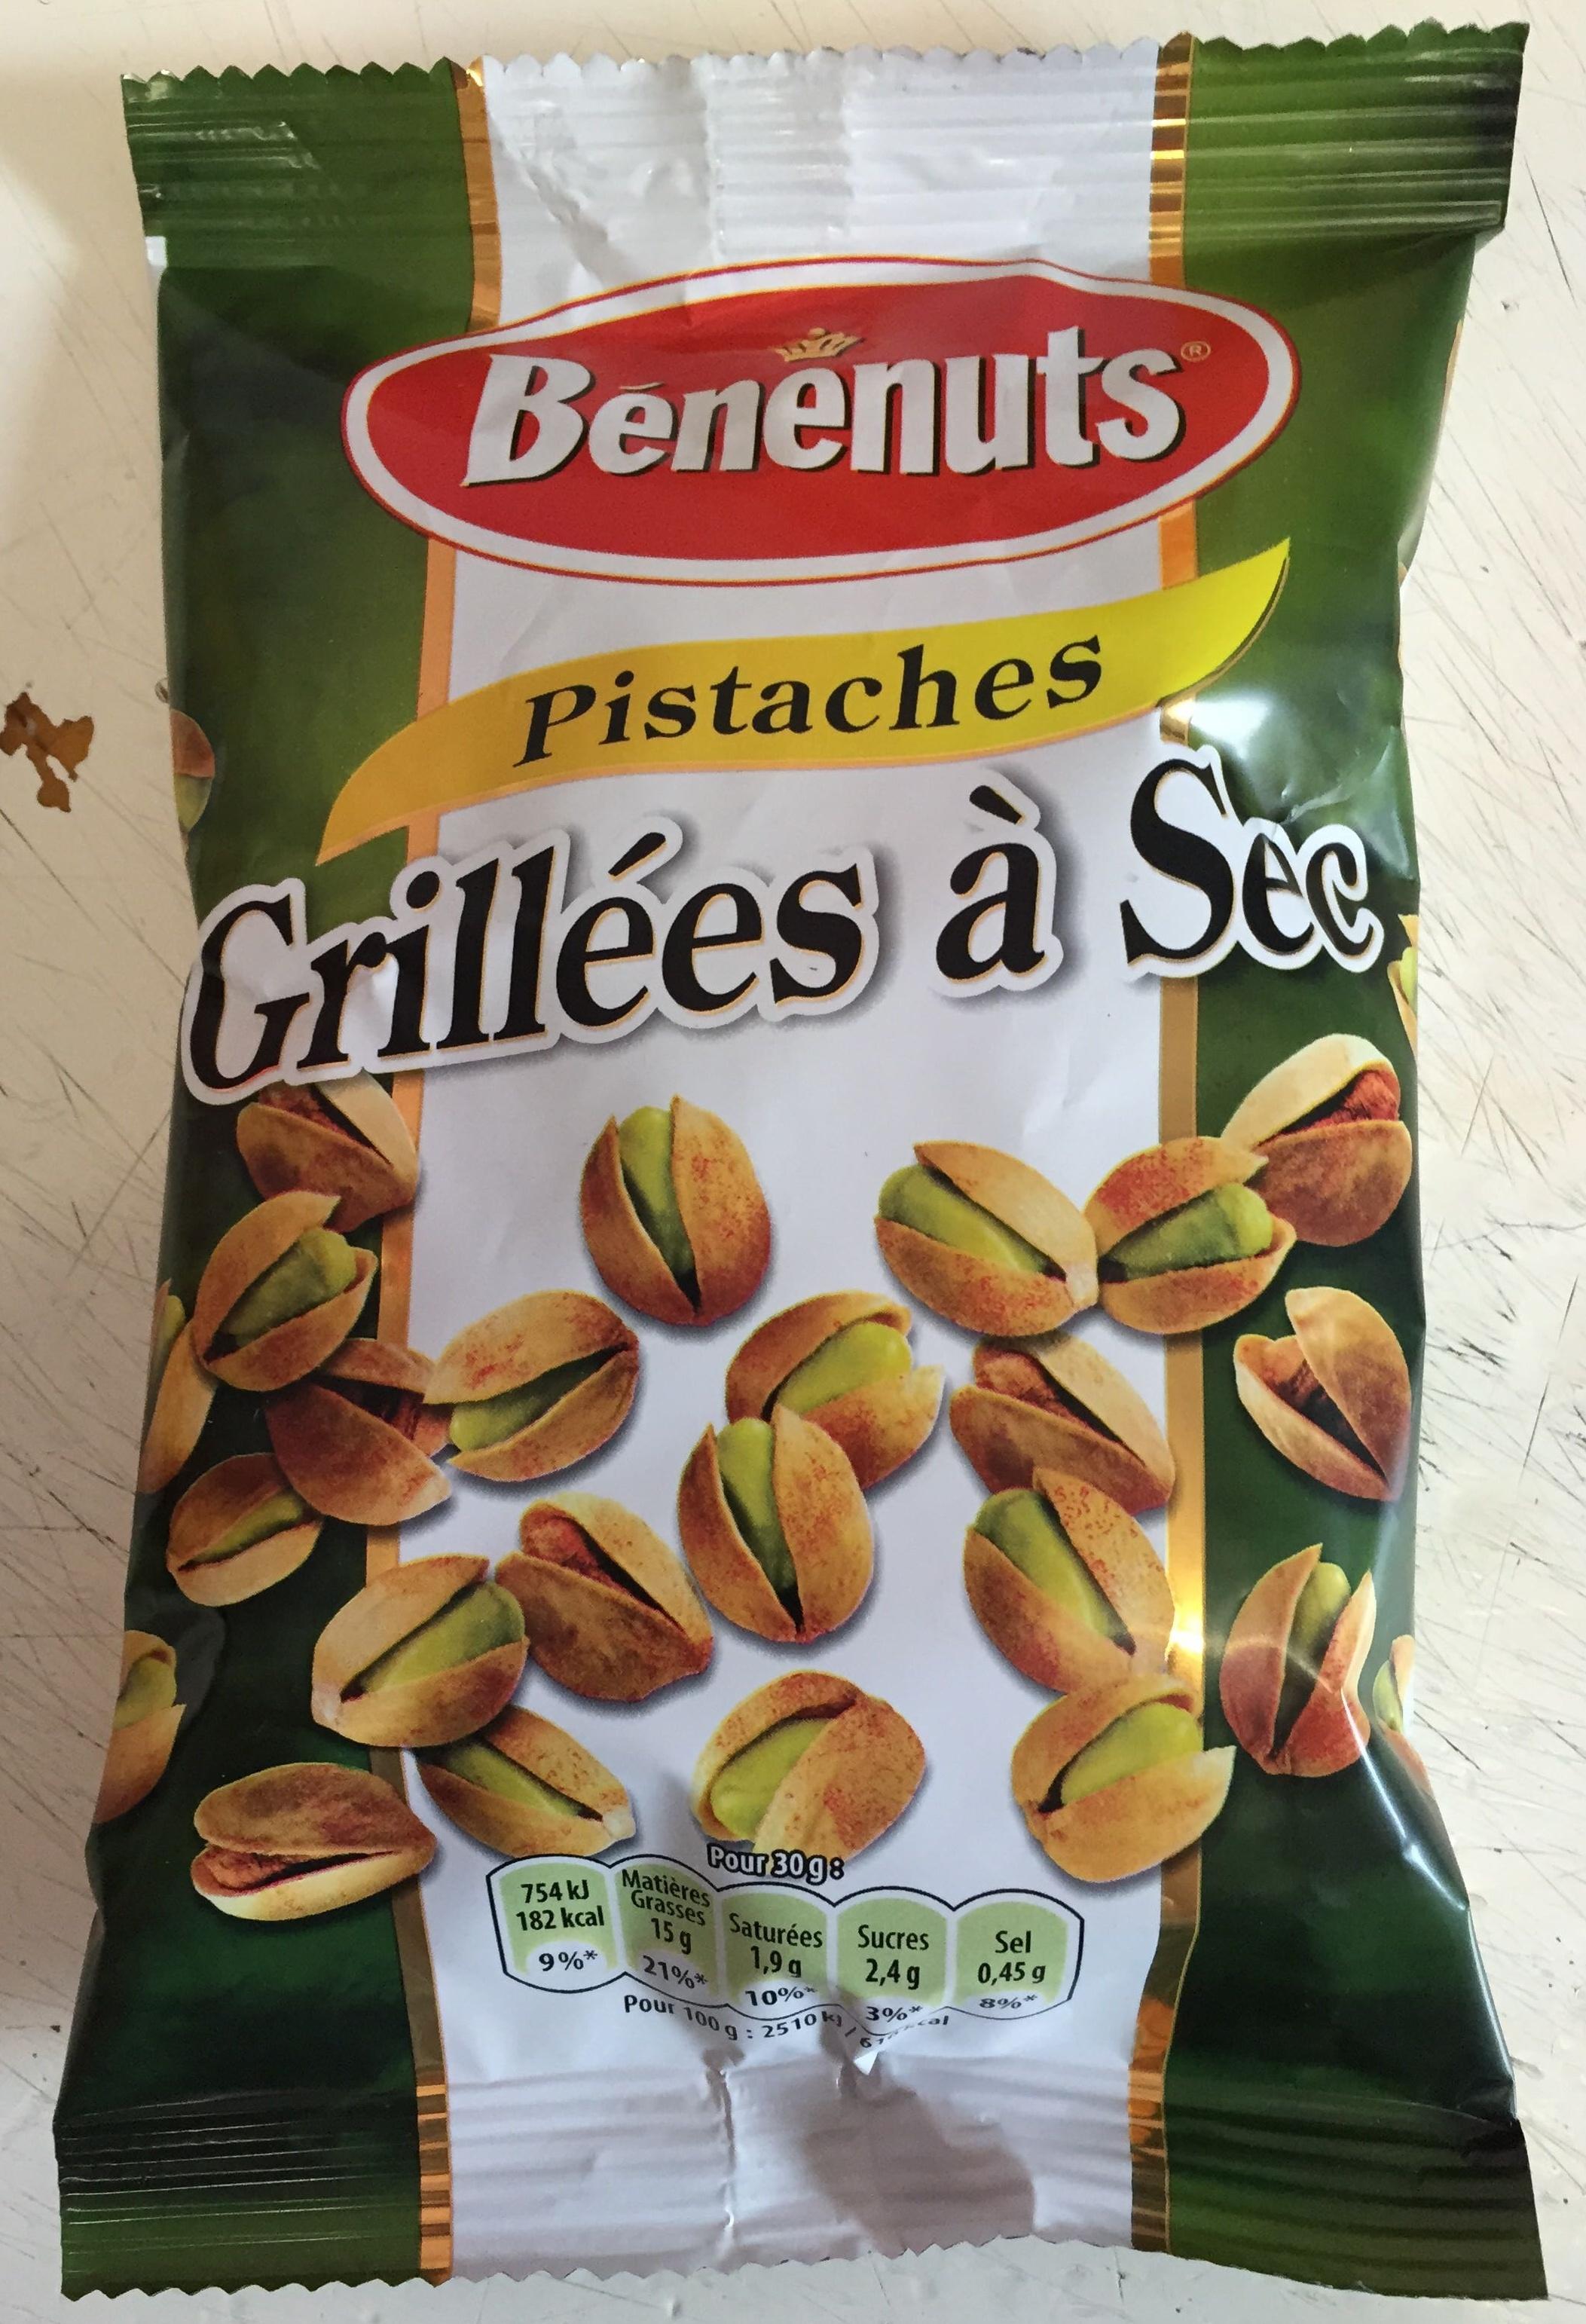 Pistaches grill es sec benenuts 100g - Calories pistaches grillees ...